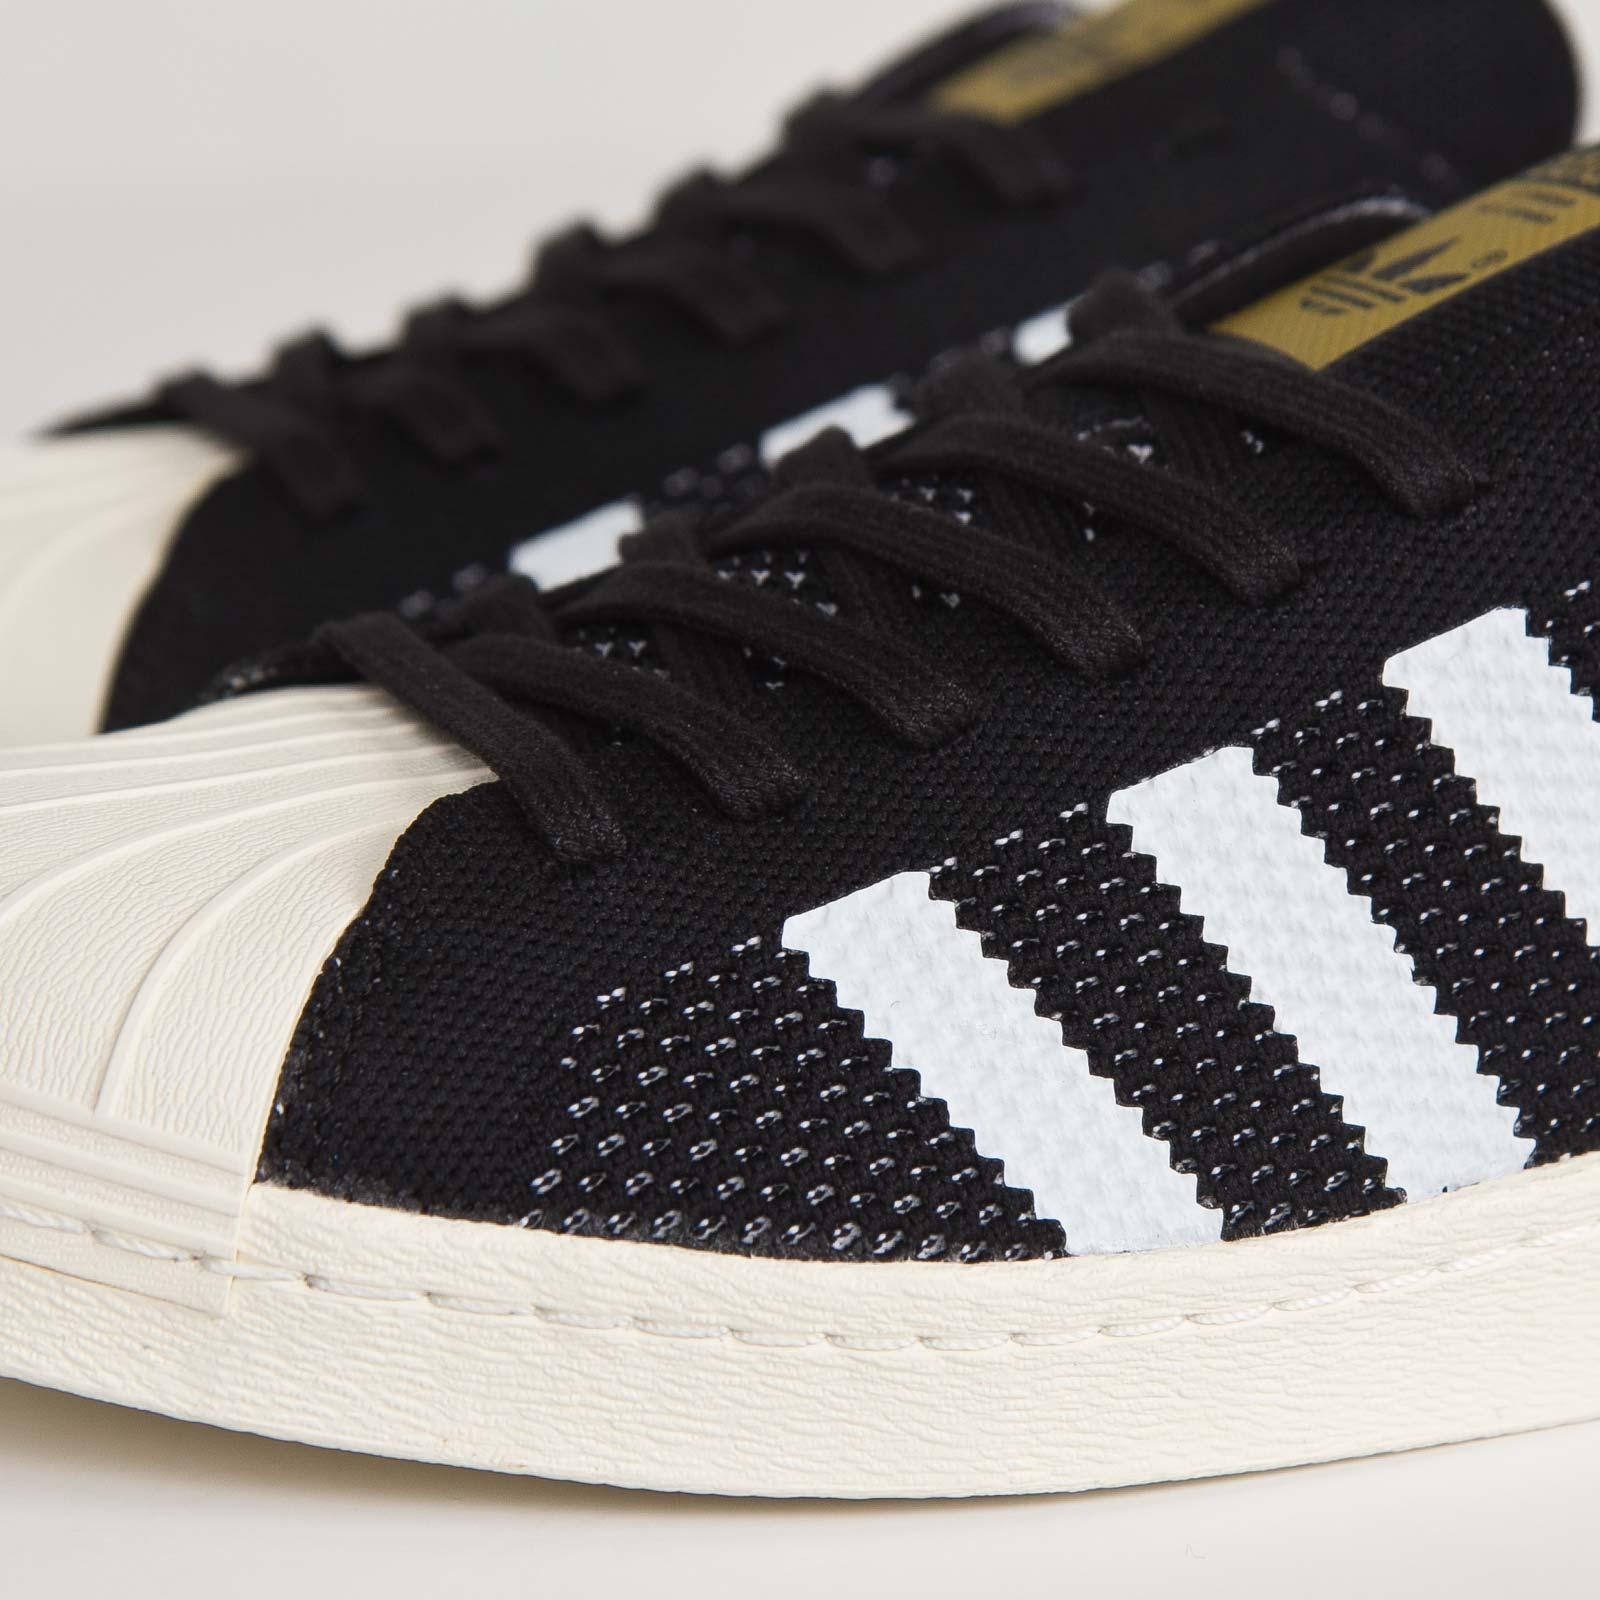 promo code a9b01 653fd adidas Superstar 80s PK - S77439 - Sneakersnstuff | sneakers ...